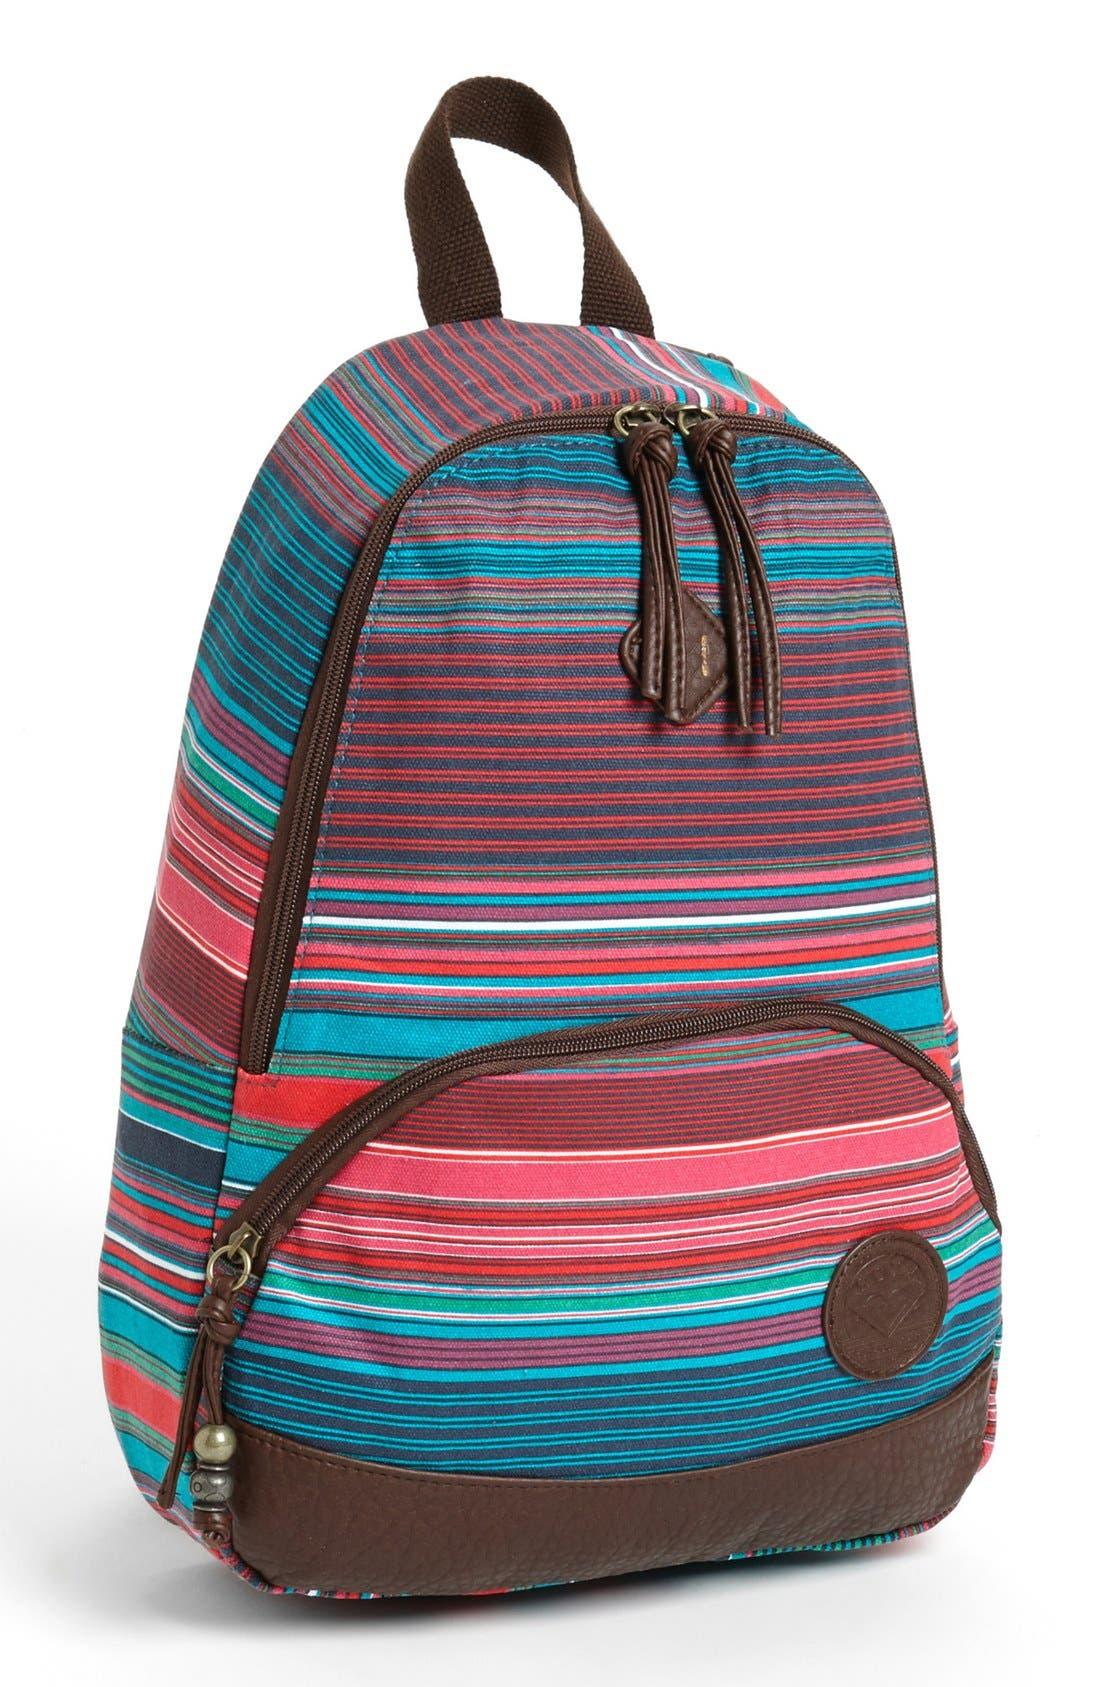 Main Image - Roxy 'Wild One' Backpack (Girls)